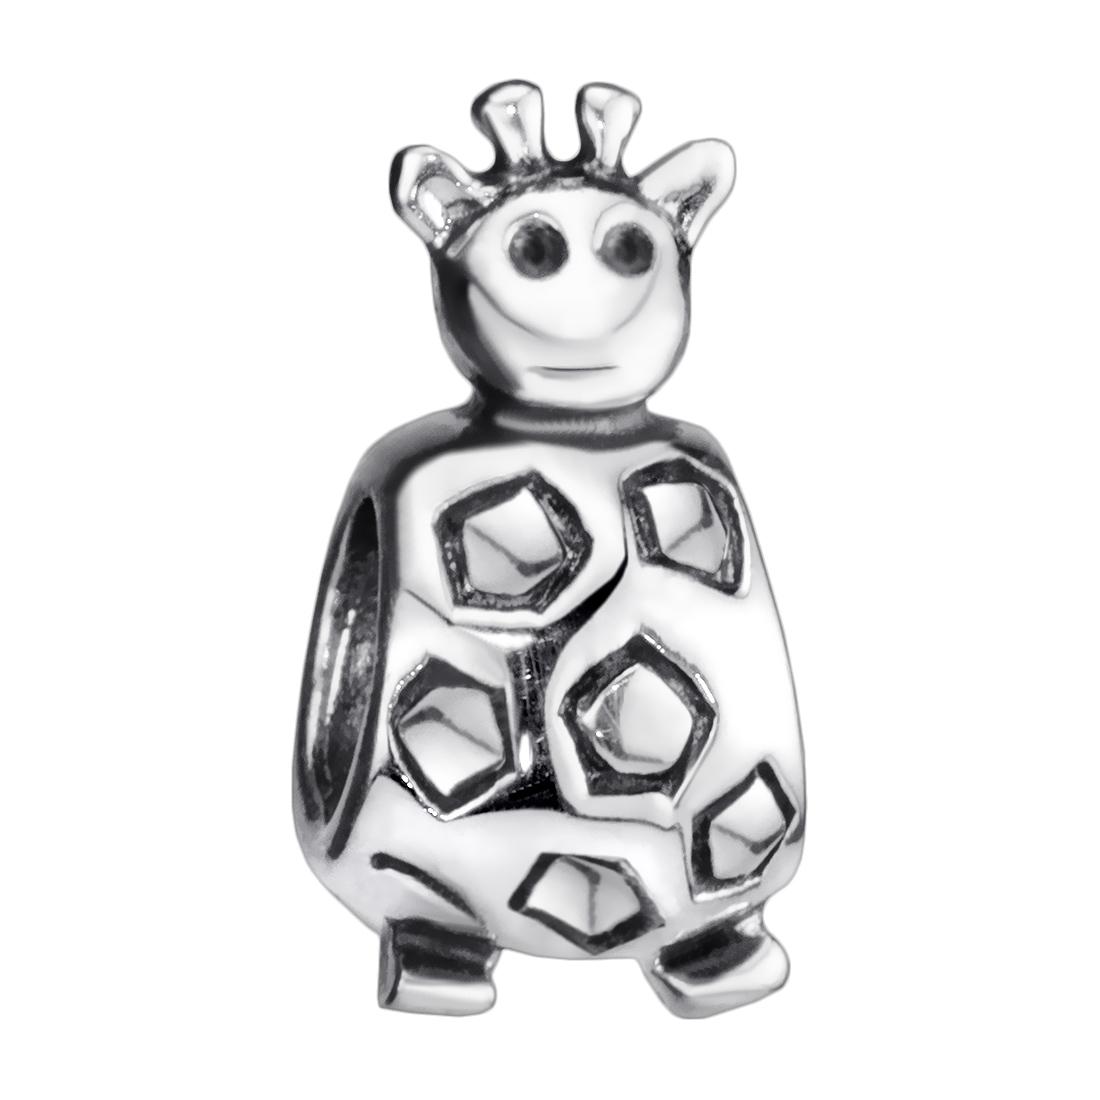 Bead Anhänger Giraffe Damen Kinder 925 Sterling Silber Tier Charm